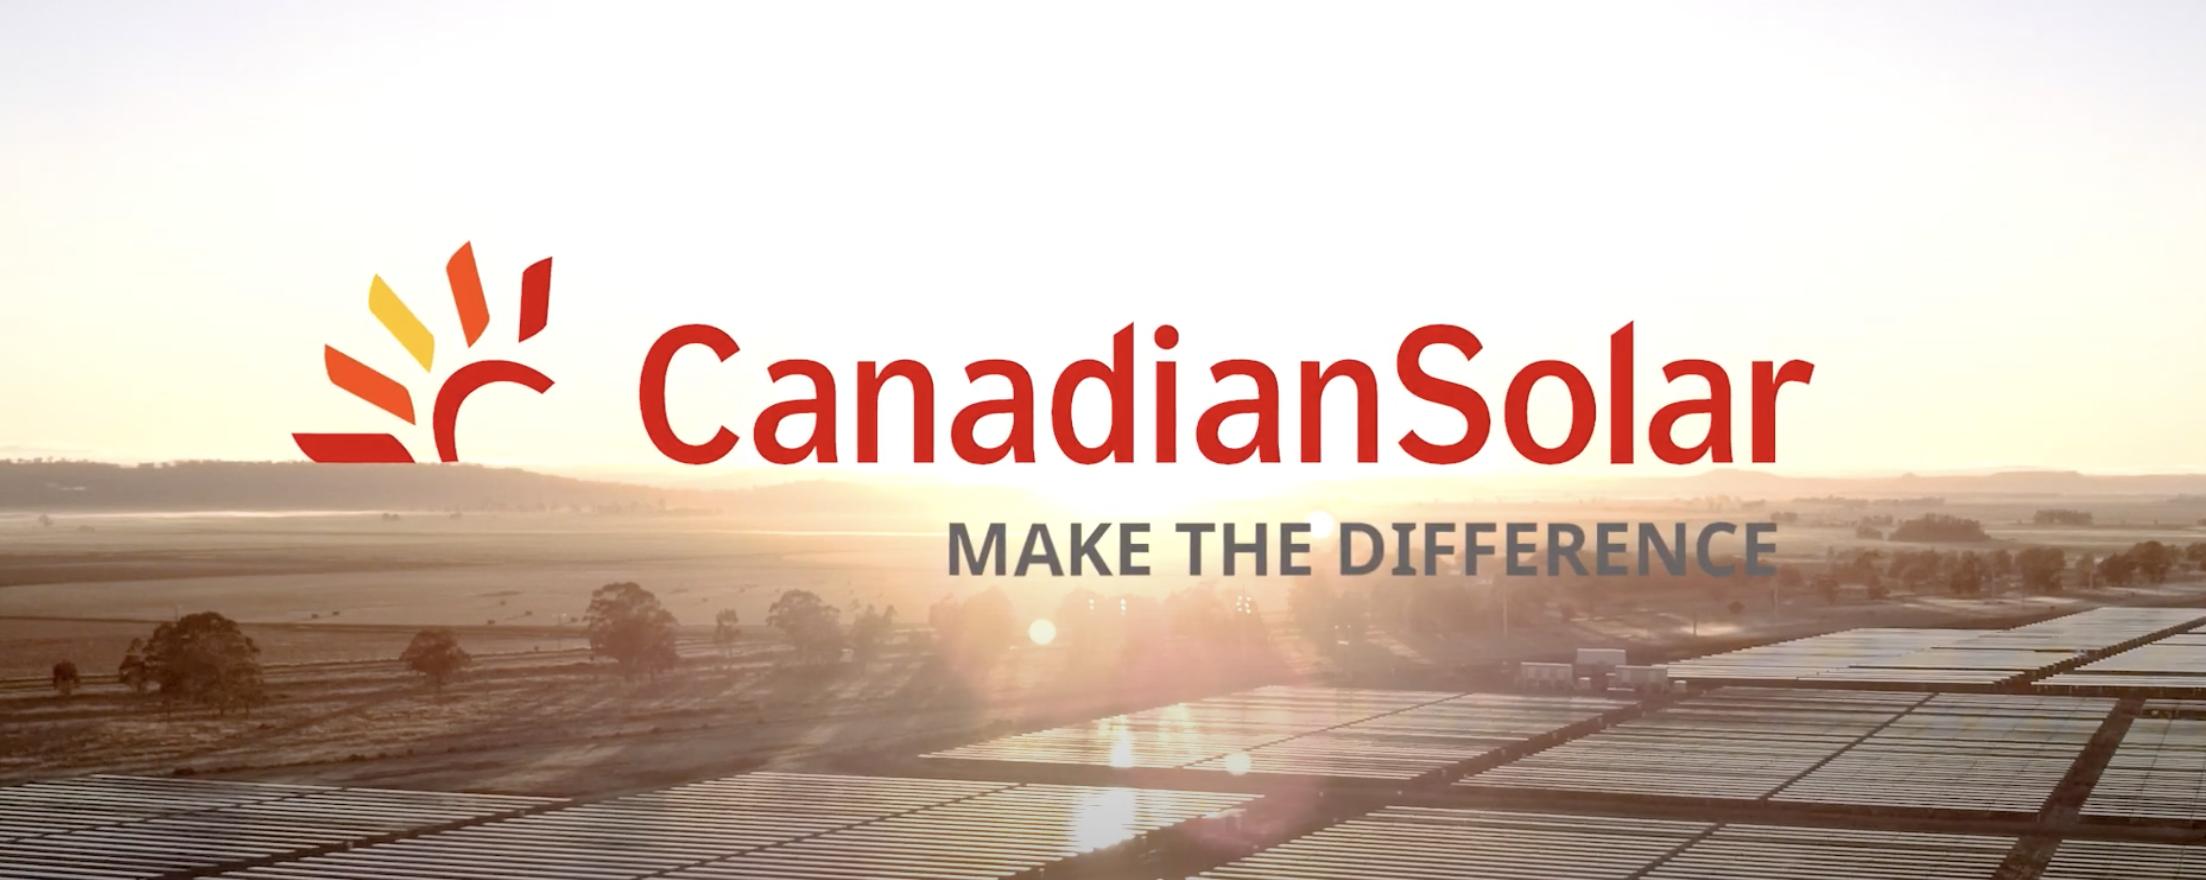 Canadian Solar Banner